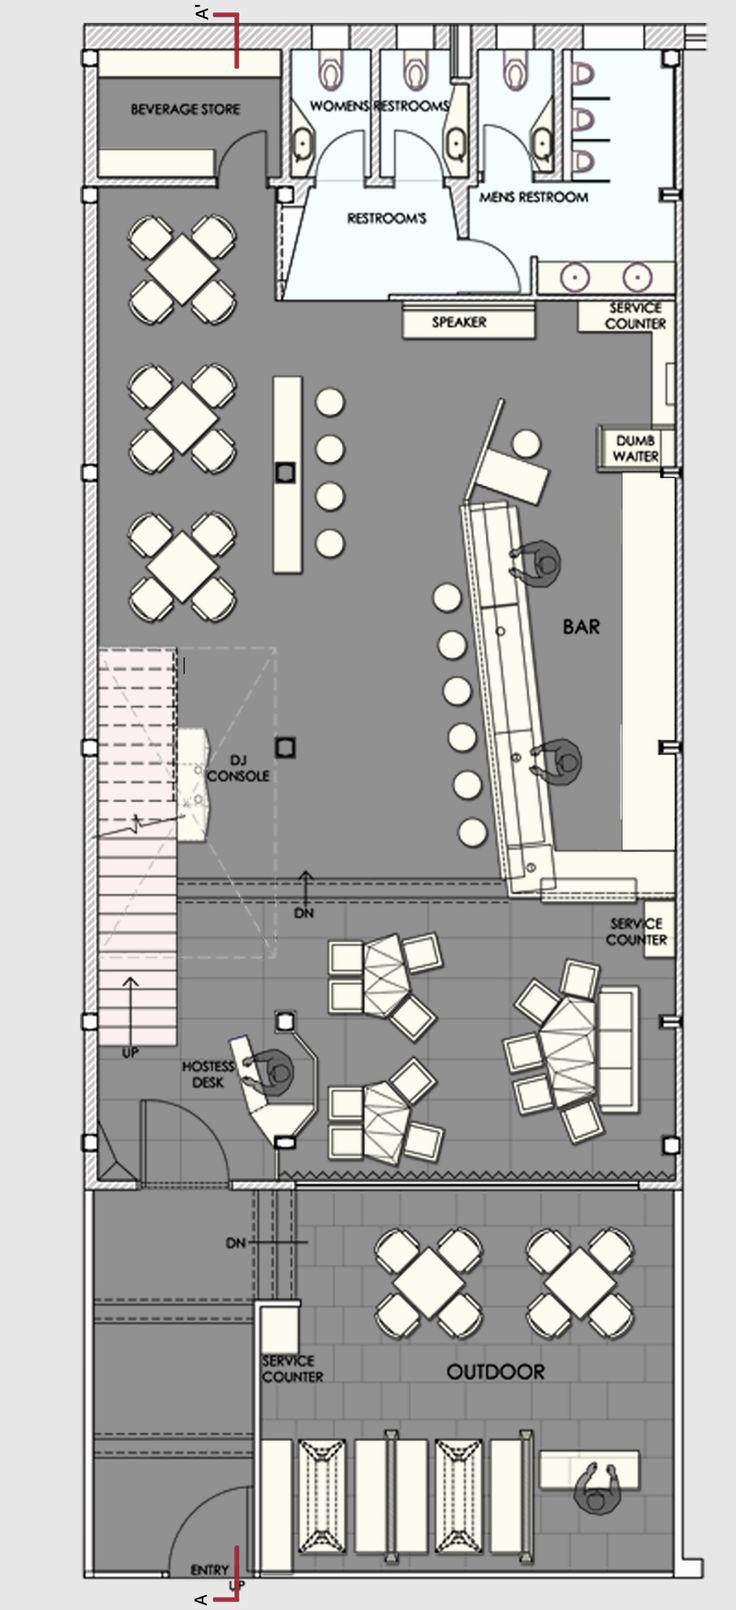 21 best cafe floor plan images on pinterest restaurant design auriga restaurant ground floor plan